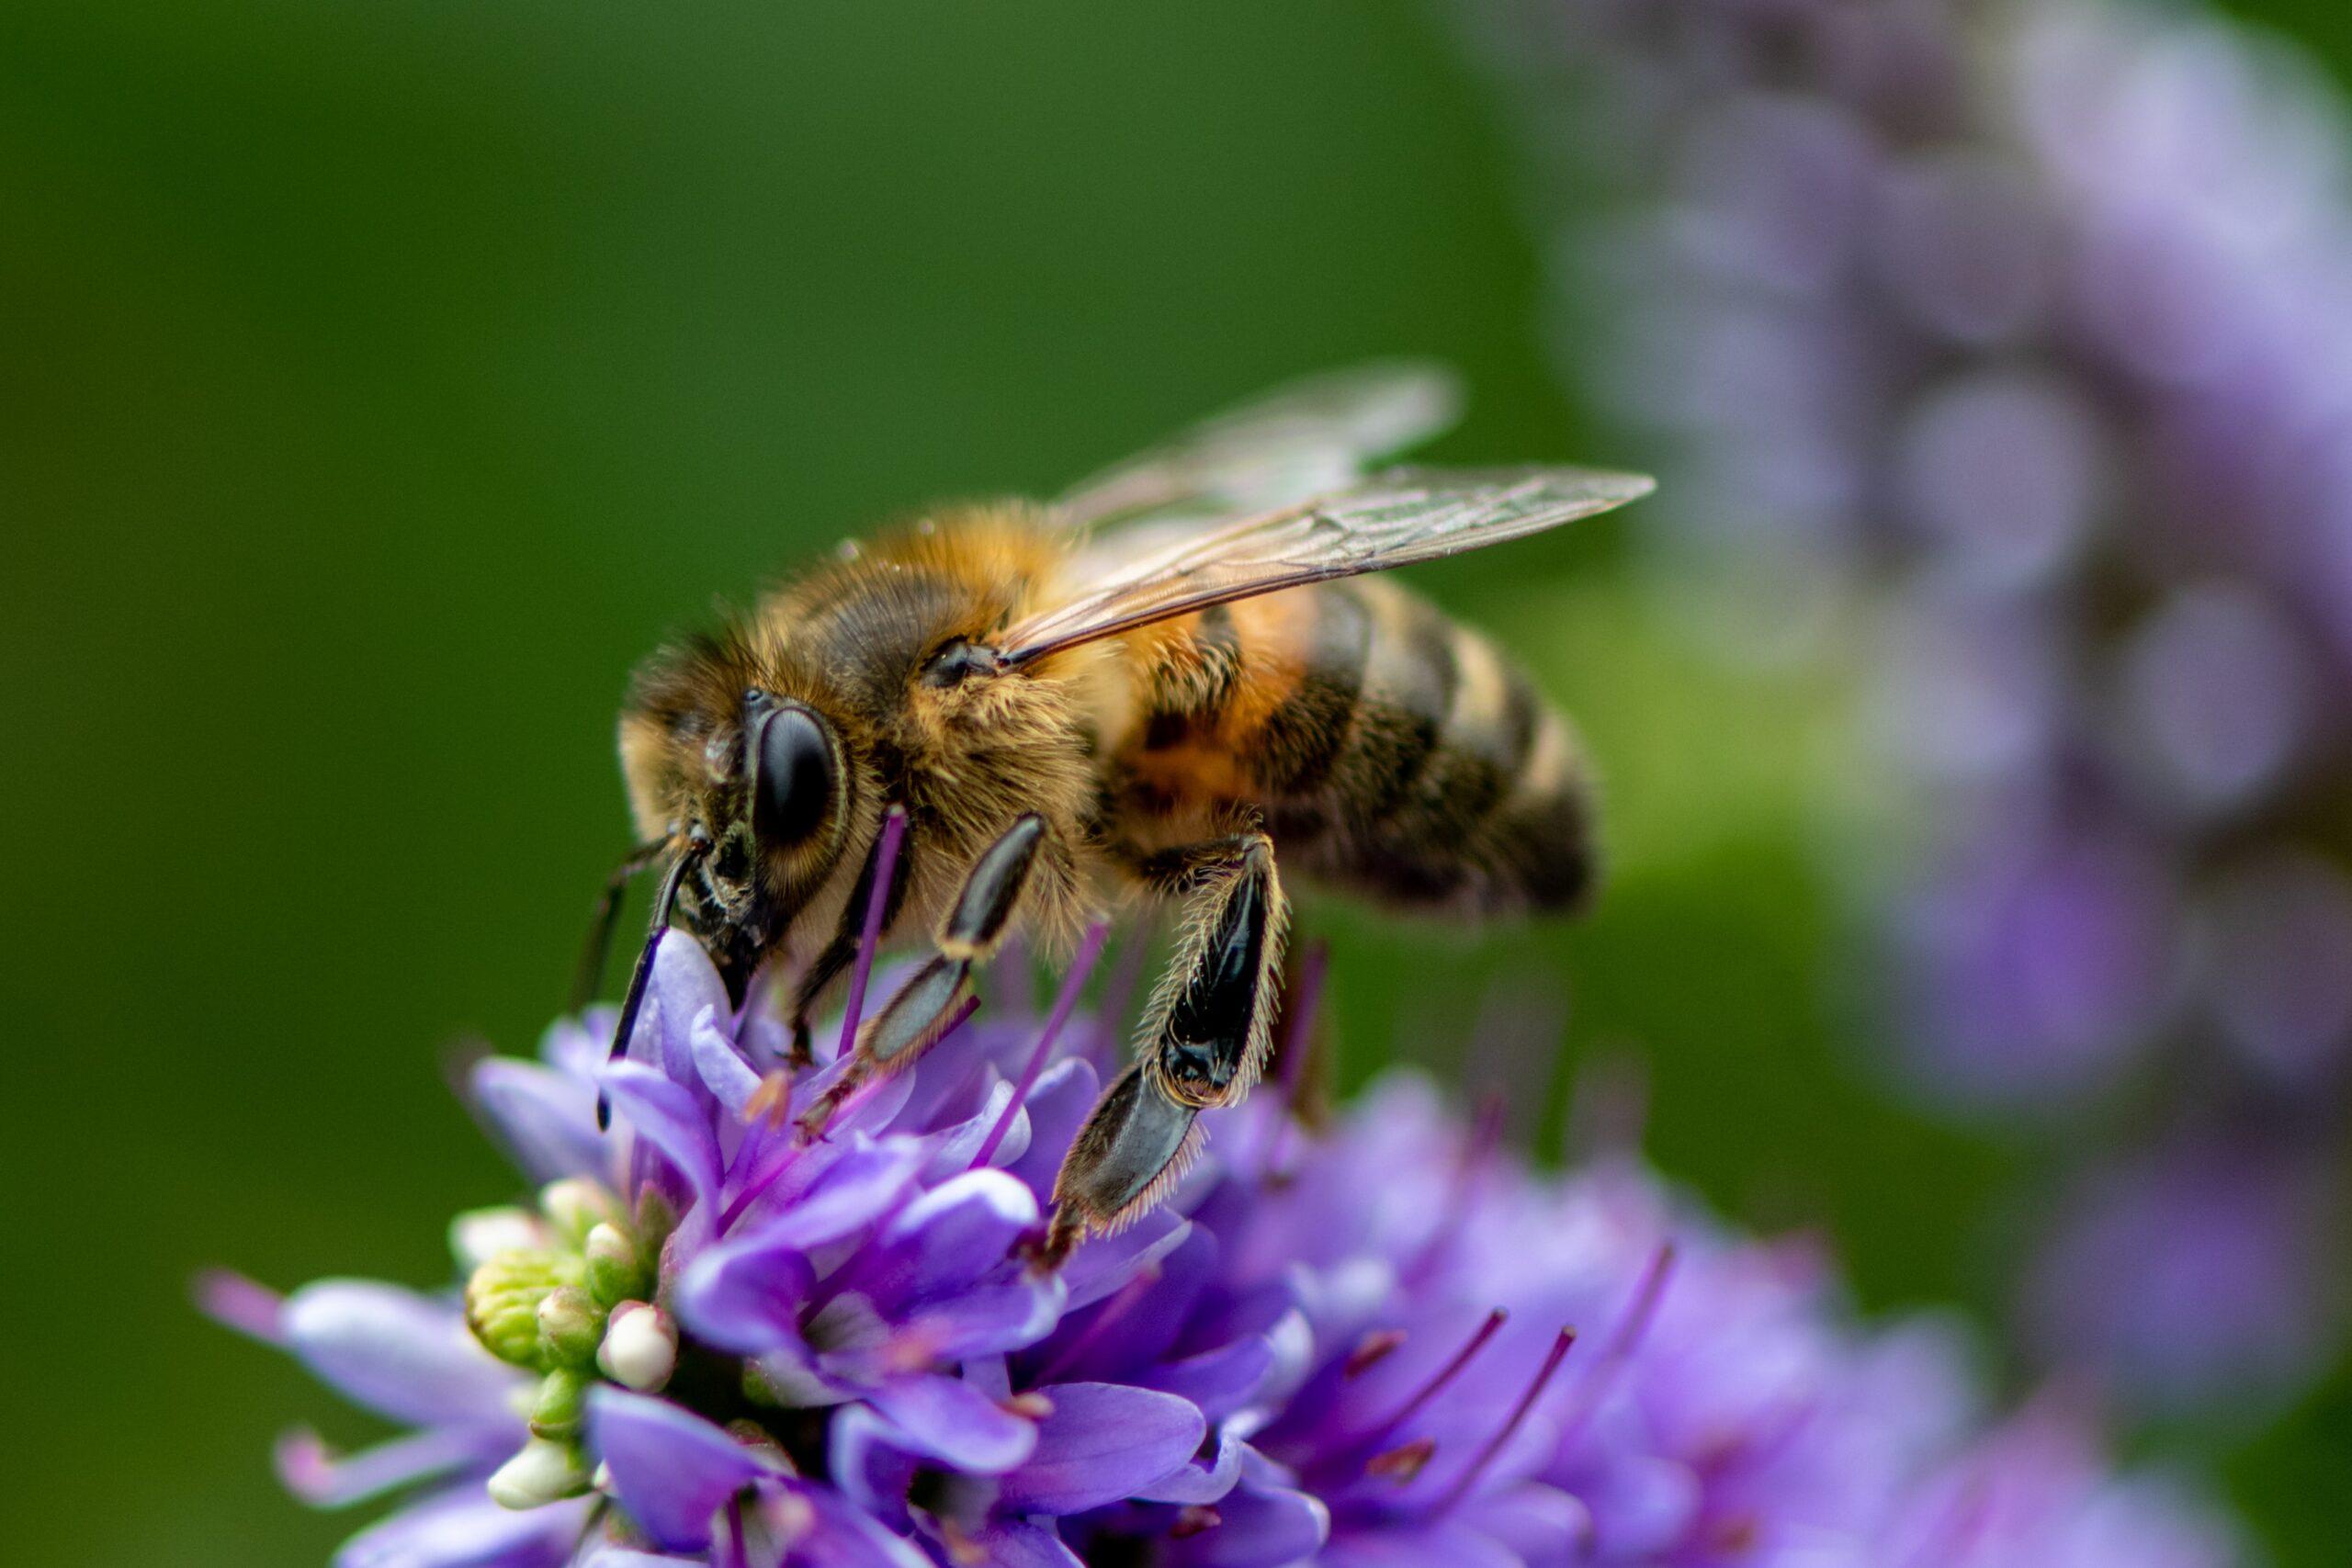 neil-harvey-Honey Bee up close on flower petal collecting nectar-unsplash